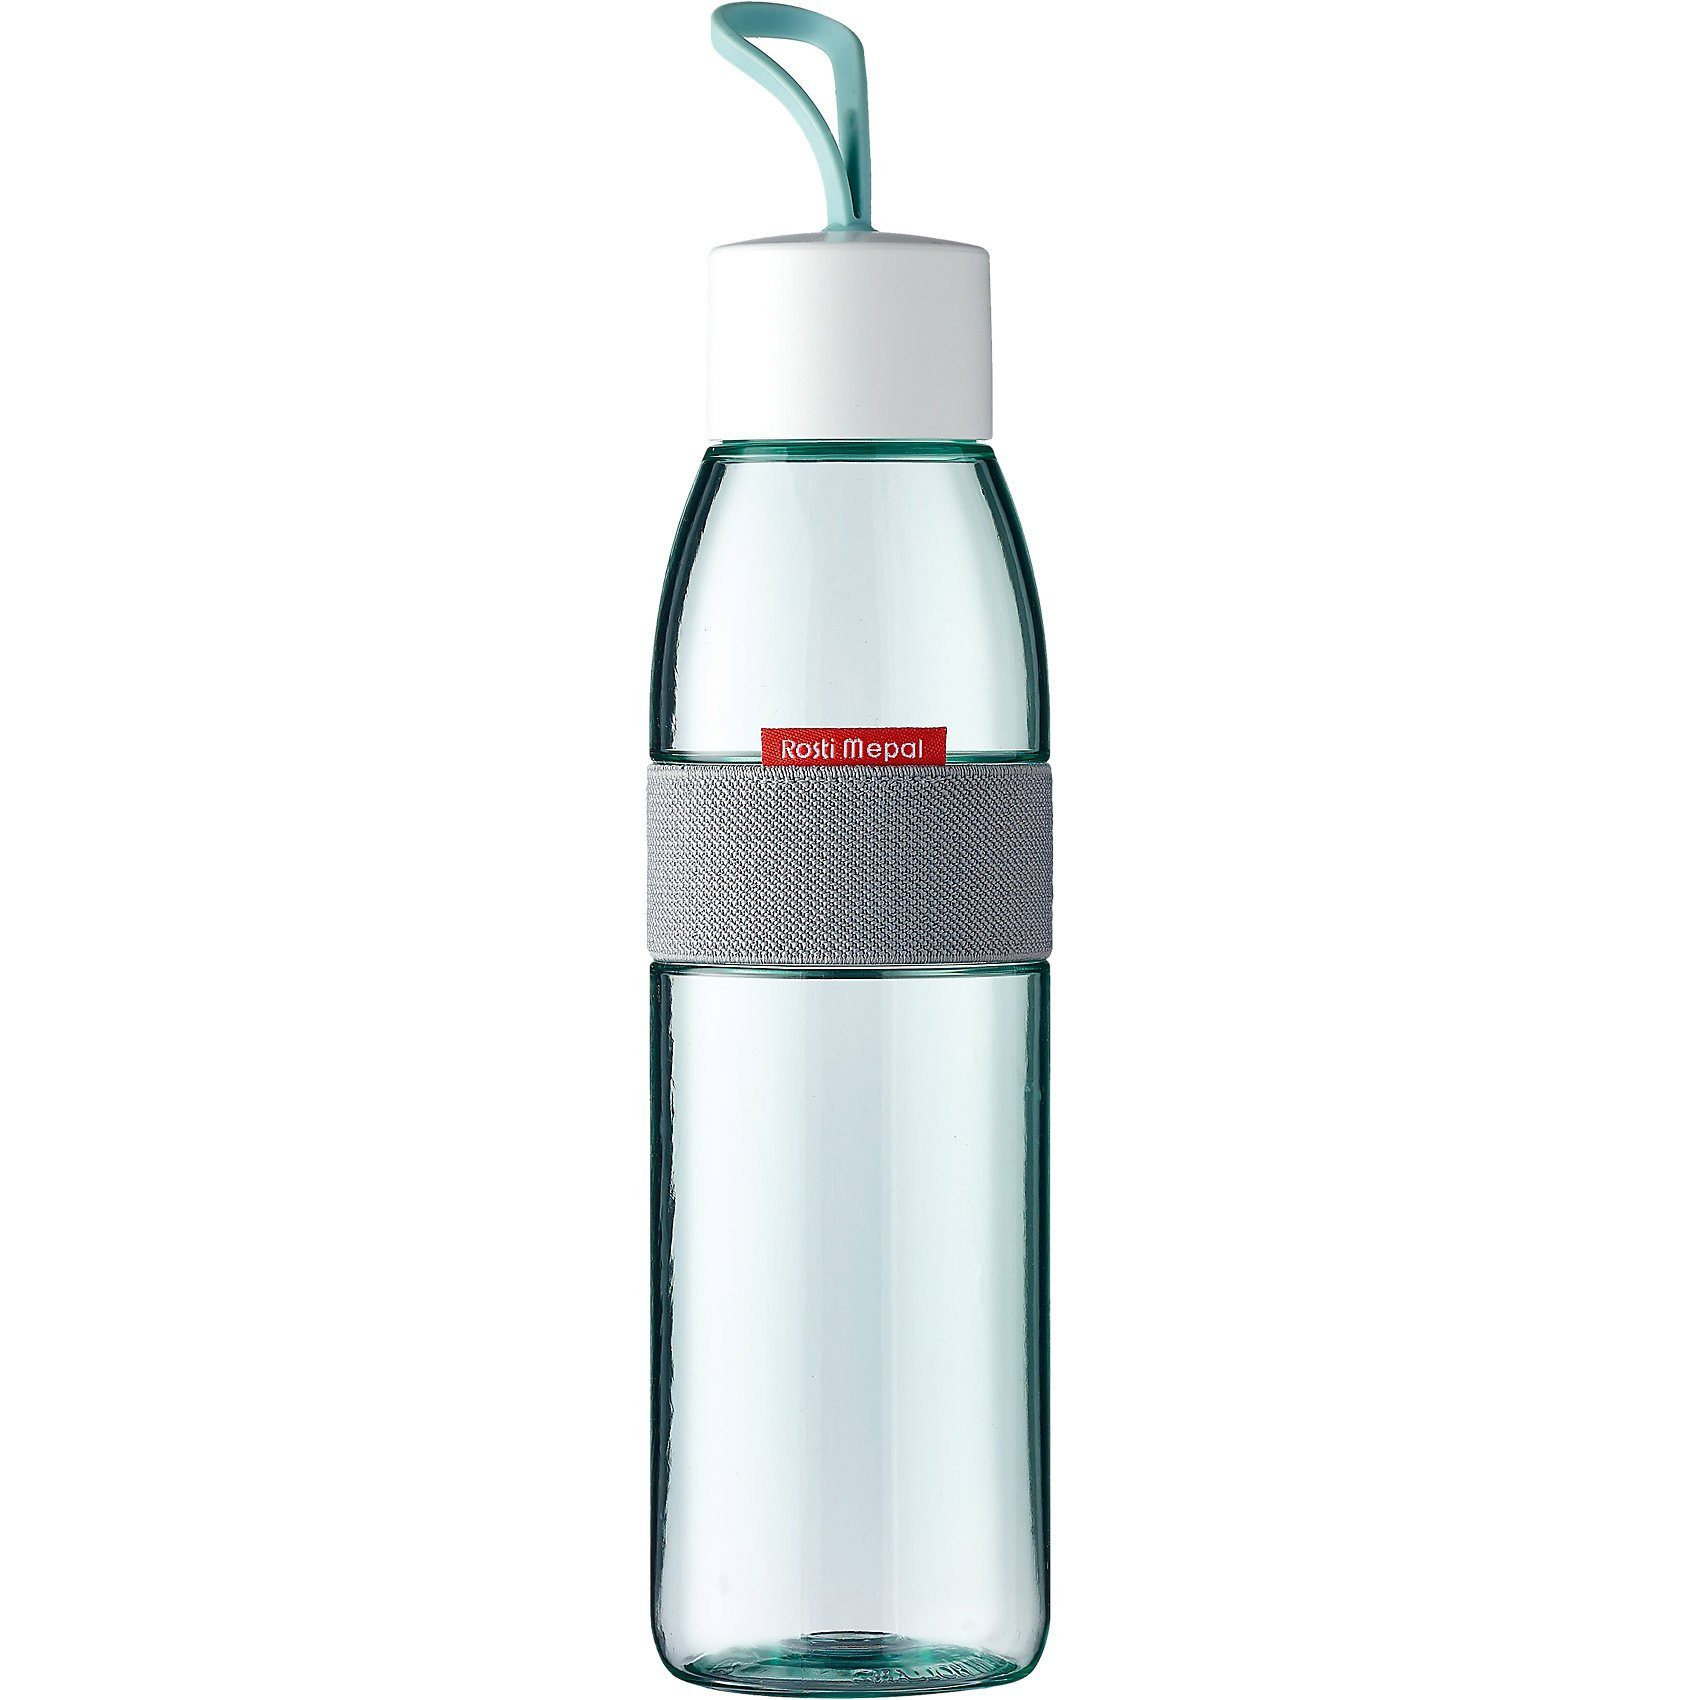 Rosti Mepal Trinkflasche ellipse nordic green, 500 ml